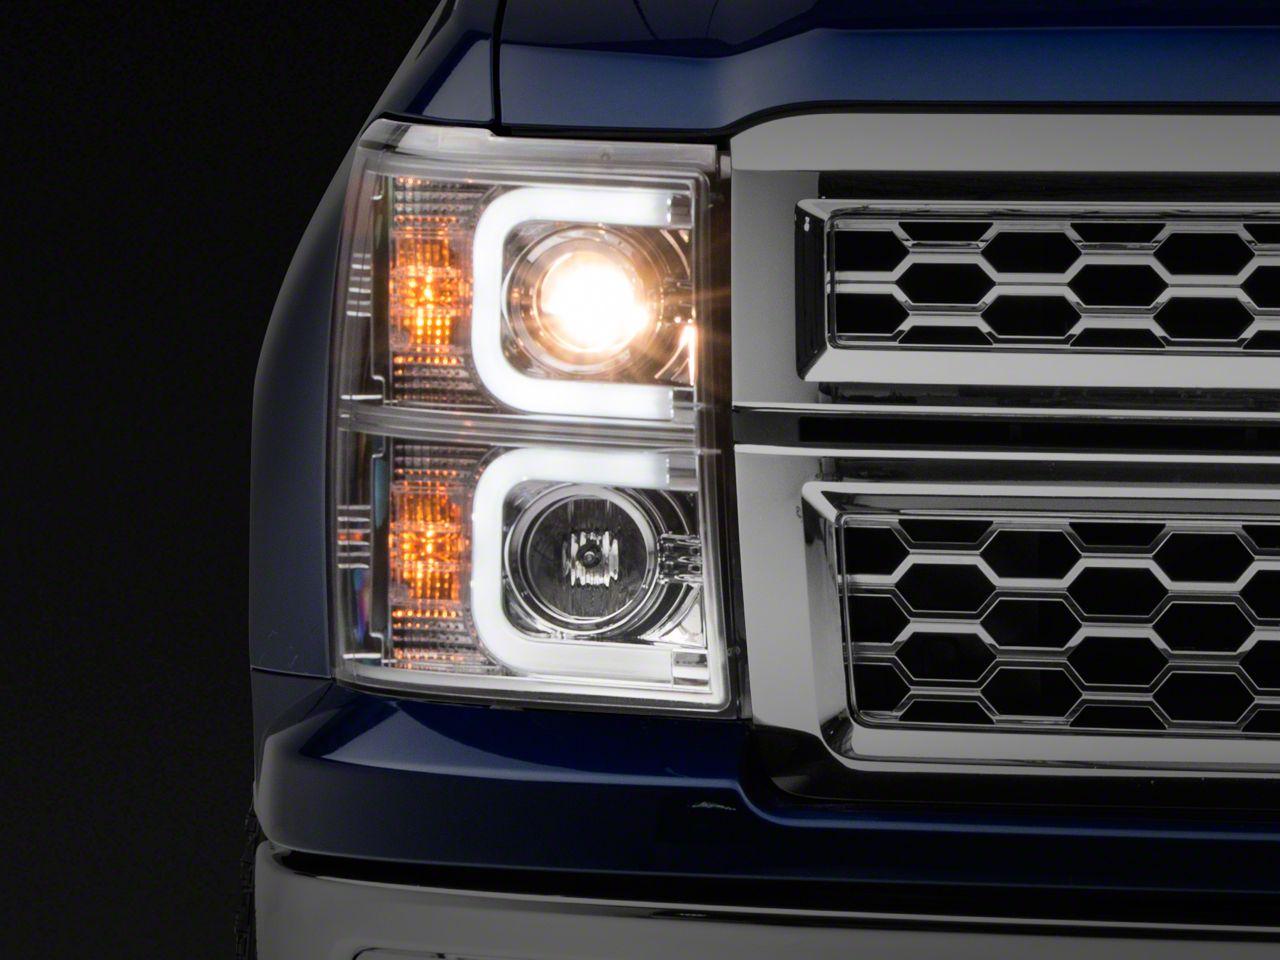 Axial Chrome Projector Headlights w/ Light Bar Daytime Running Lights (14-15 Silverado 1500)